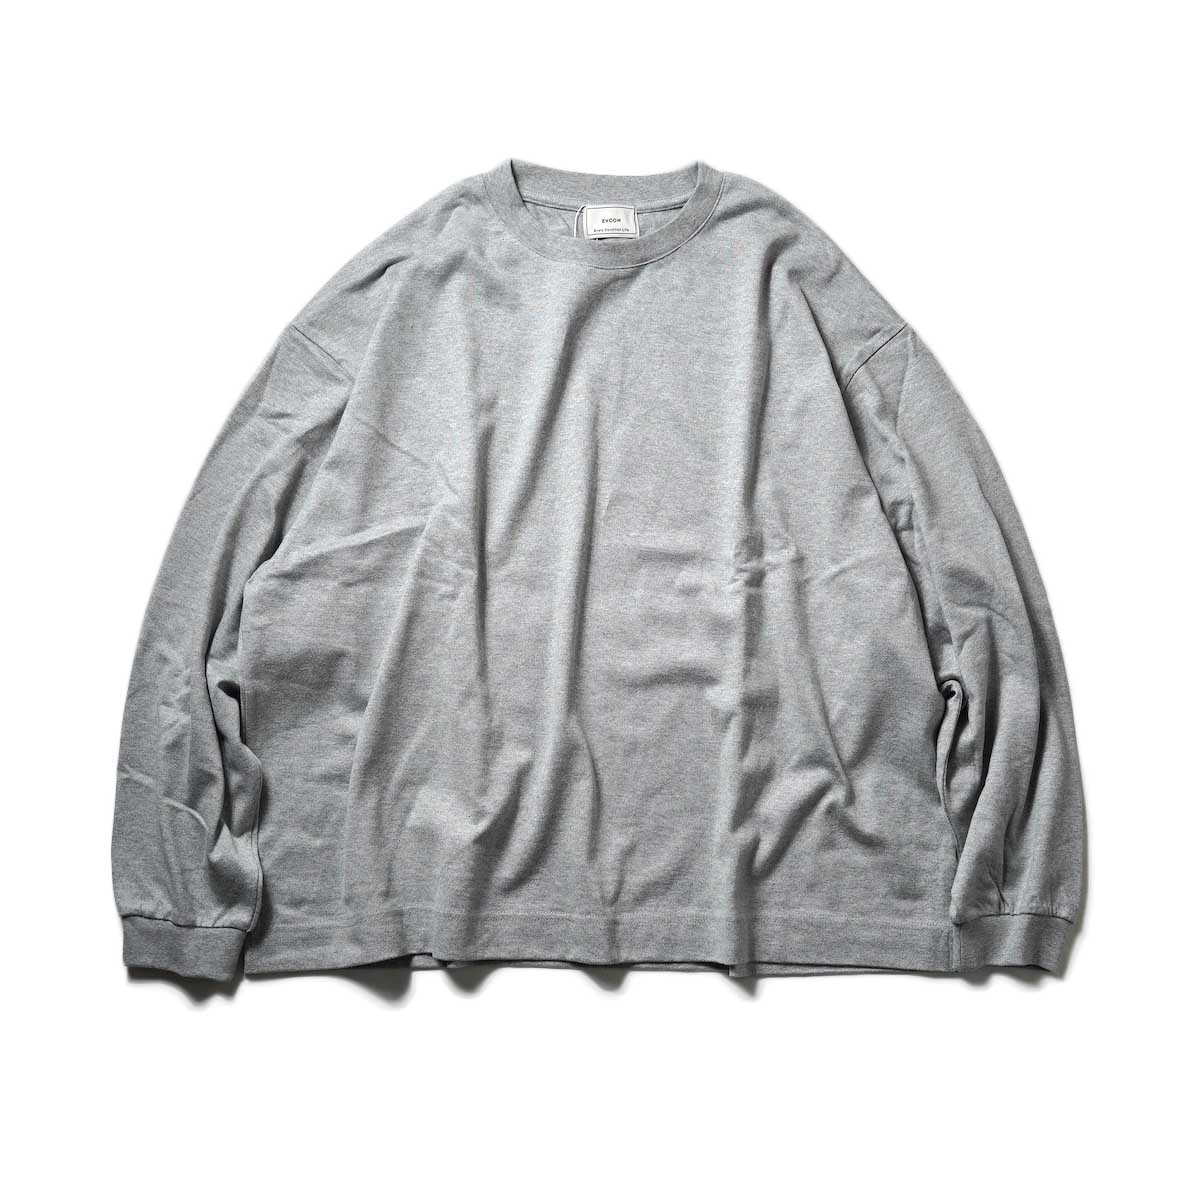 EVCON / WIDE L/S T-Shirt (Gray)